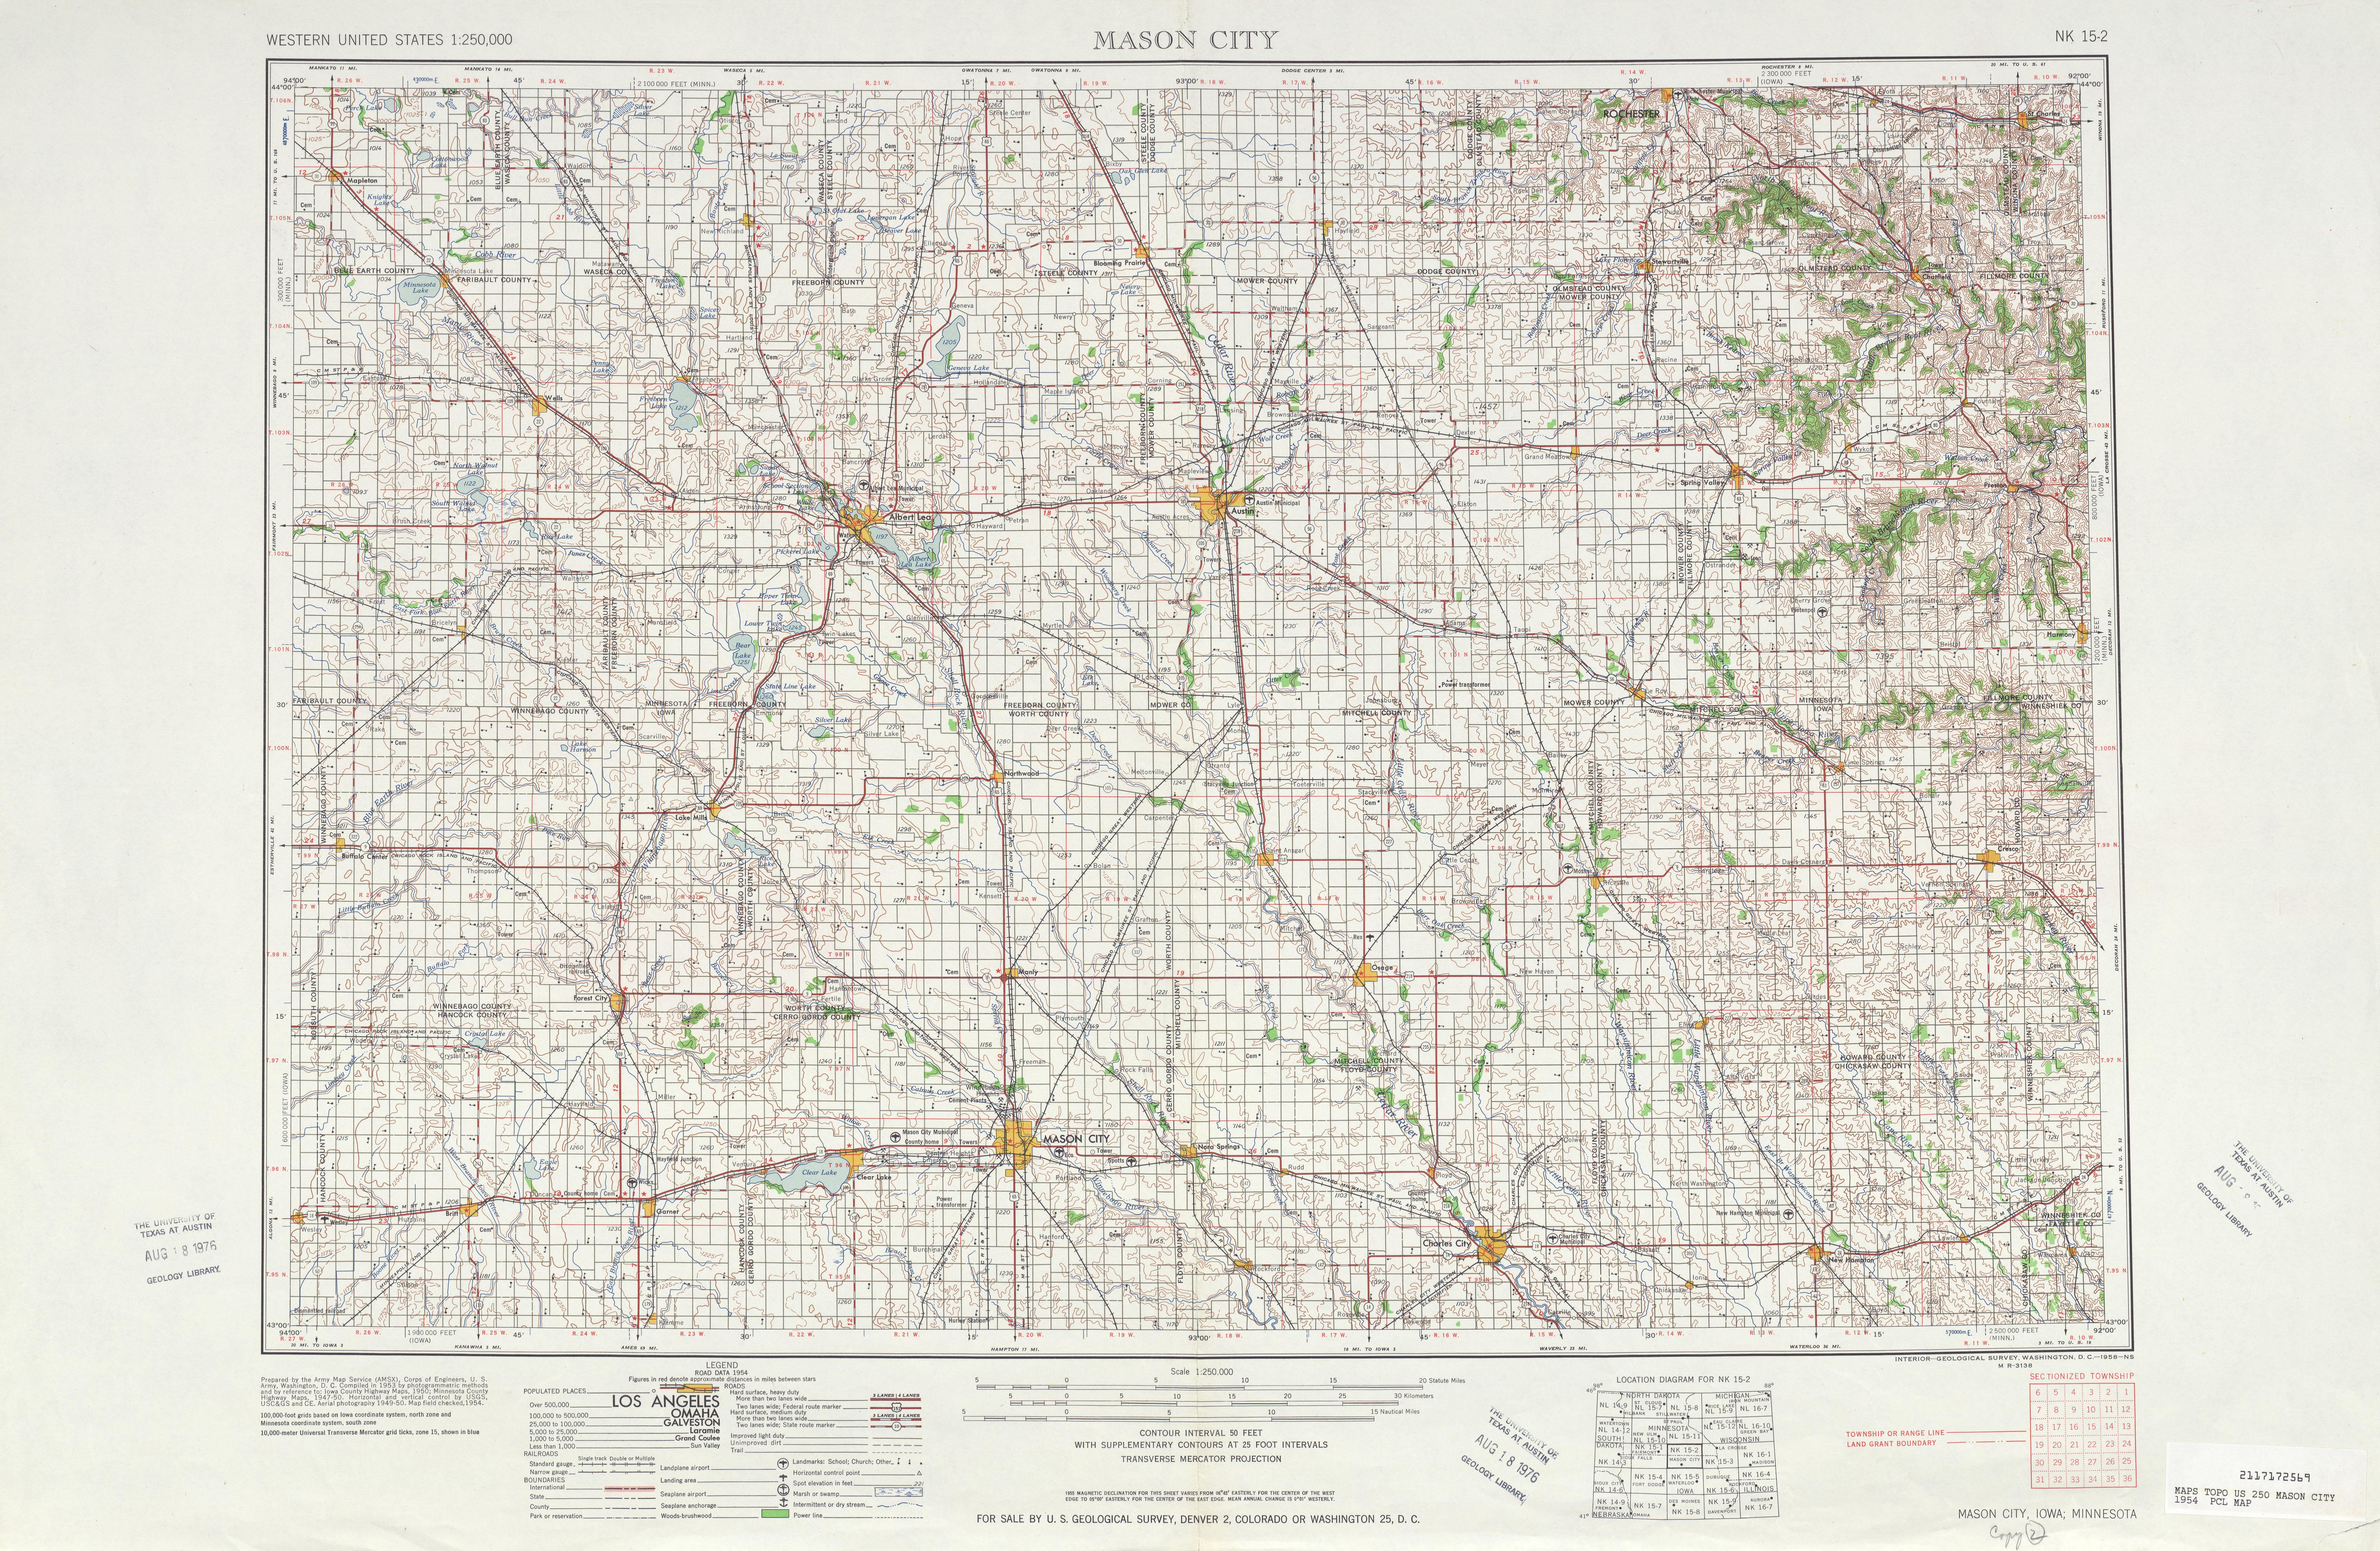 Mason City Topographic Map Sheet, United States 1954